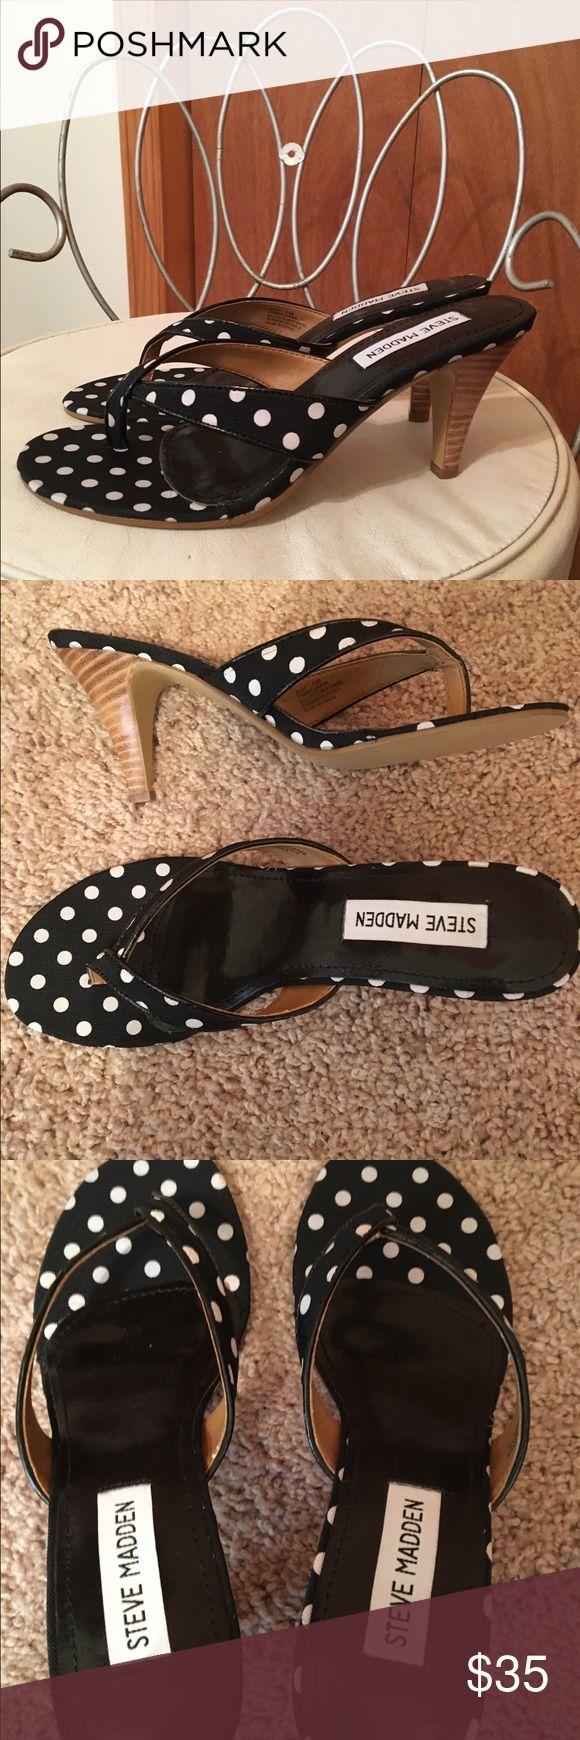 Brand new Steve Madden sandals😄❤ Gorgeous black and white heel sandals size 7.5 😄❤♠️ Steve Madden Shoes Sandals